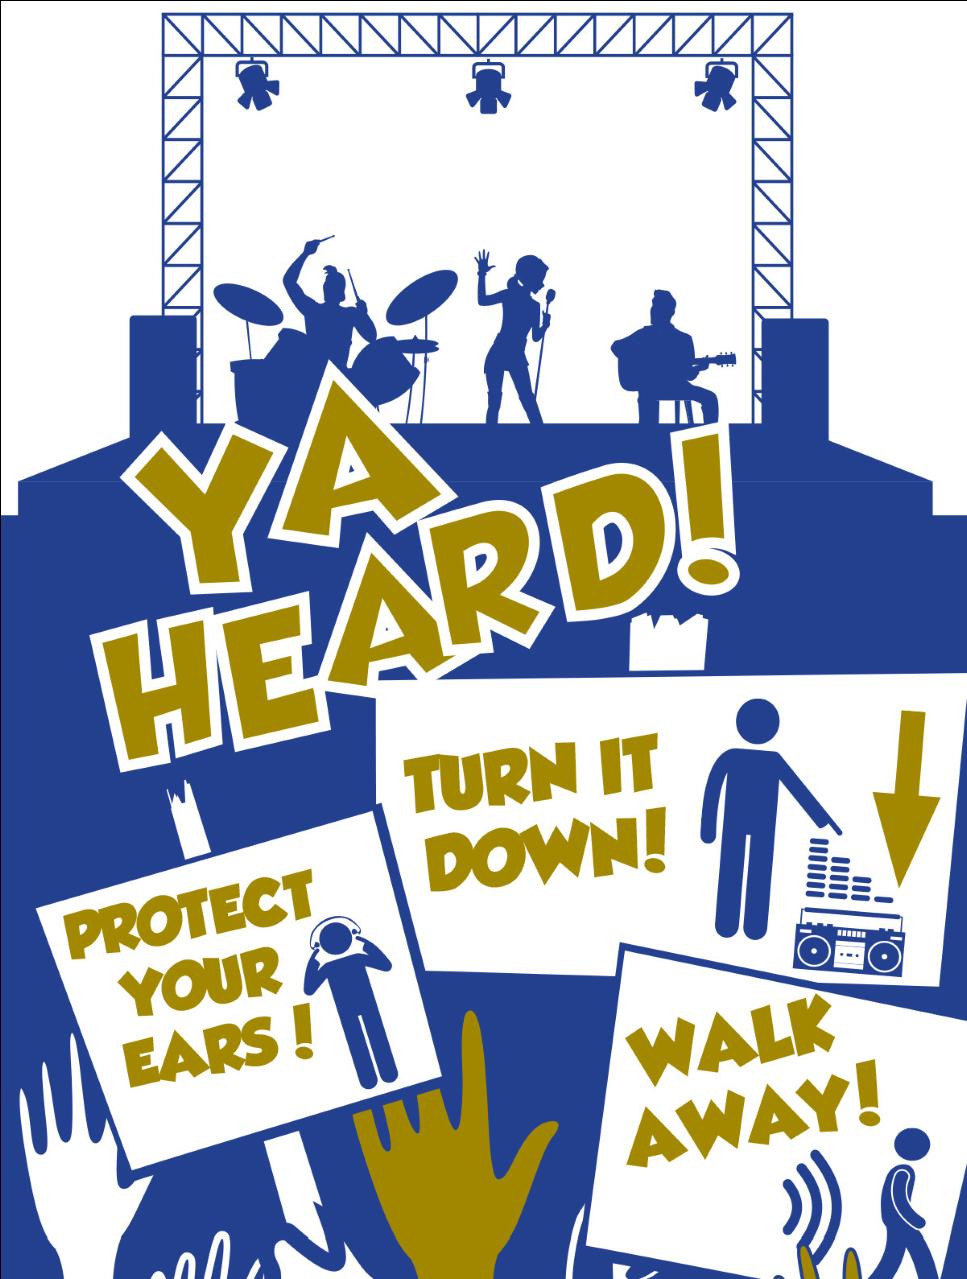 Ya Heard! Protect Your Ears! Turn It Down! Walk Away!